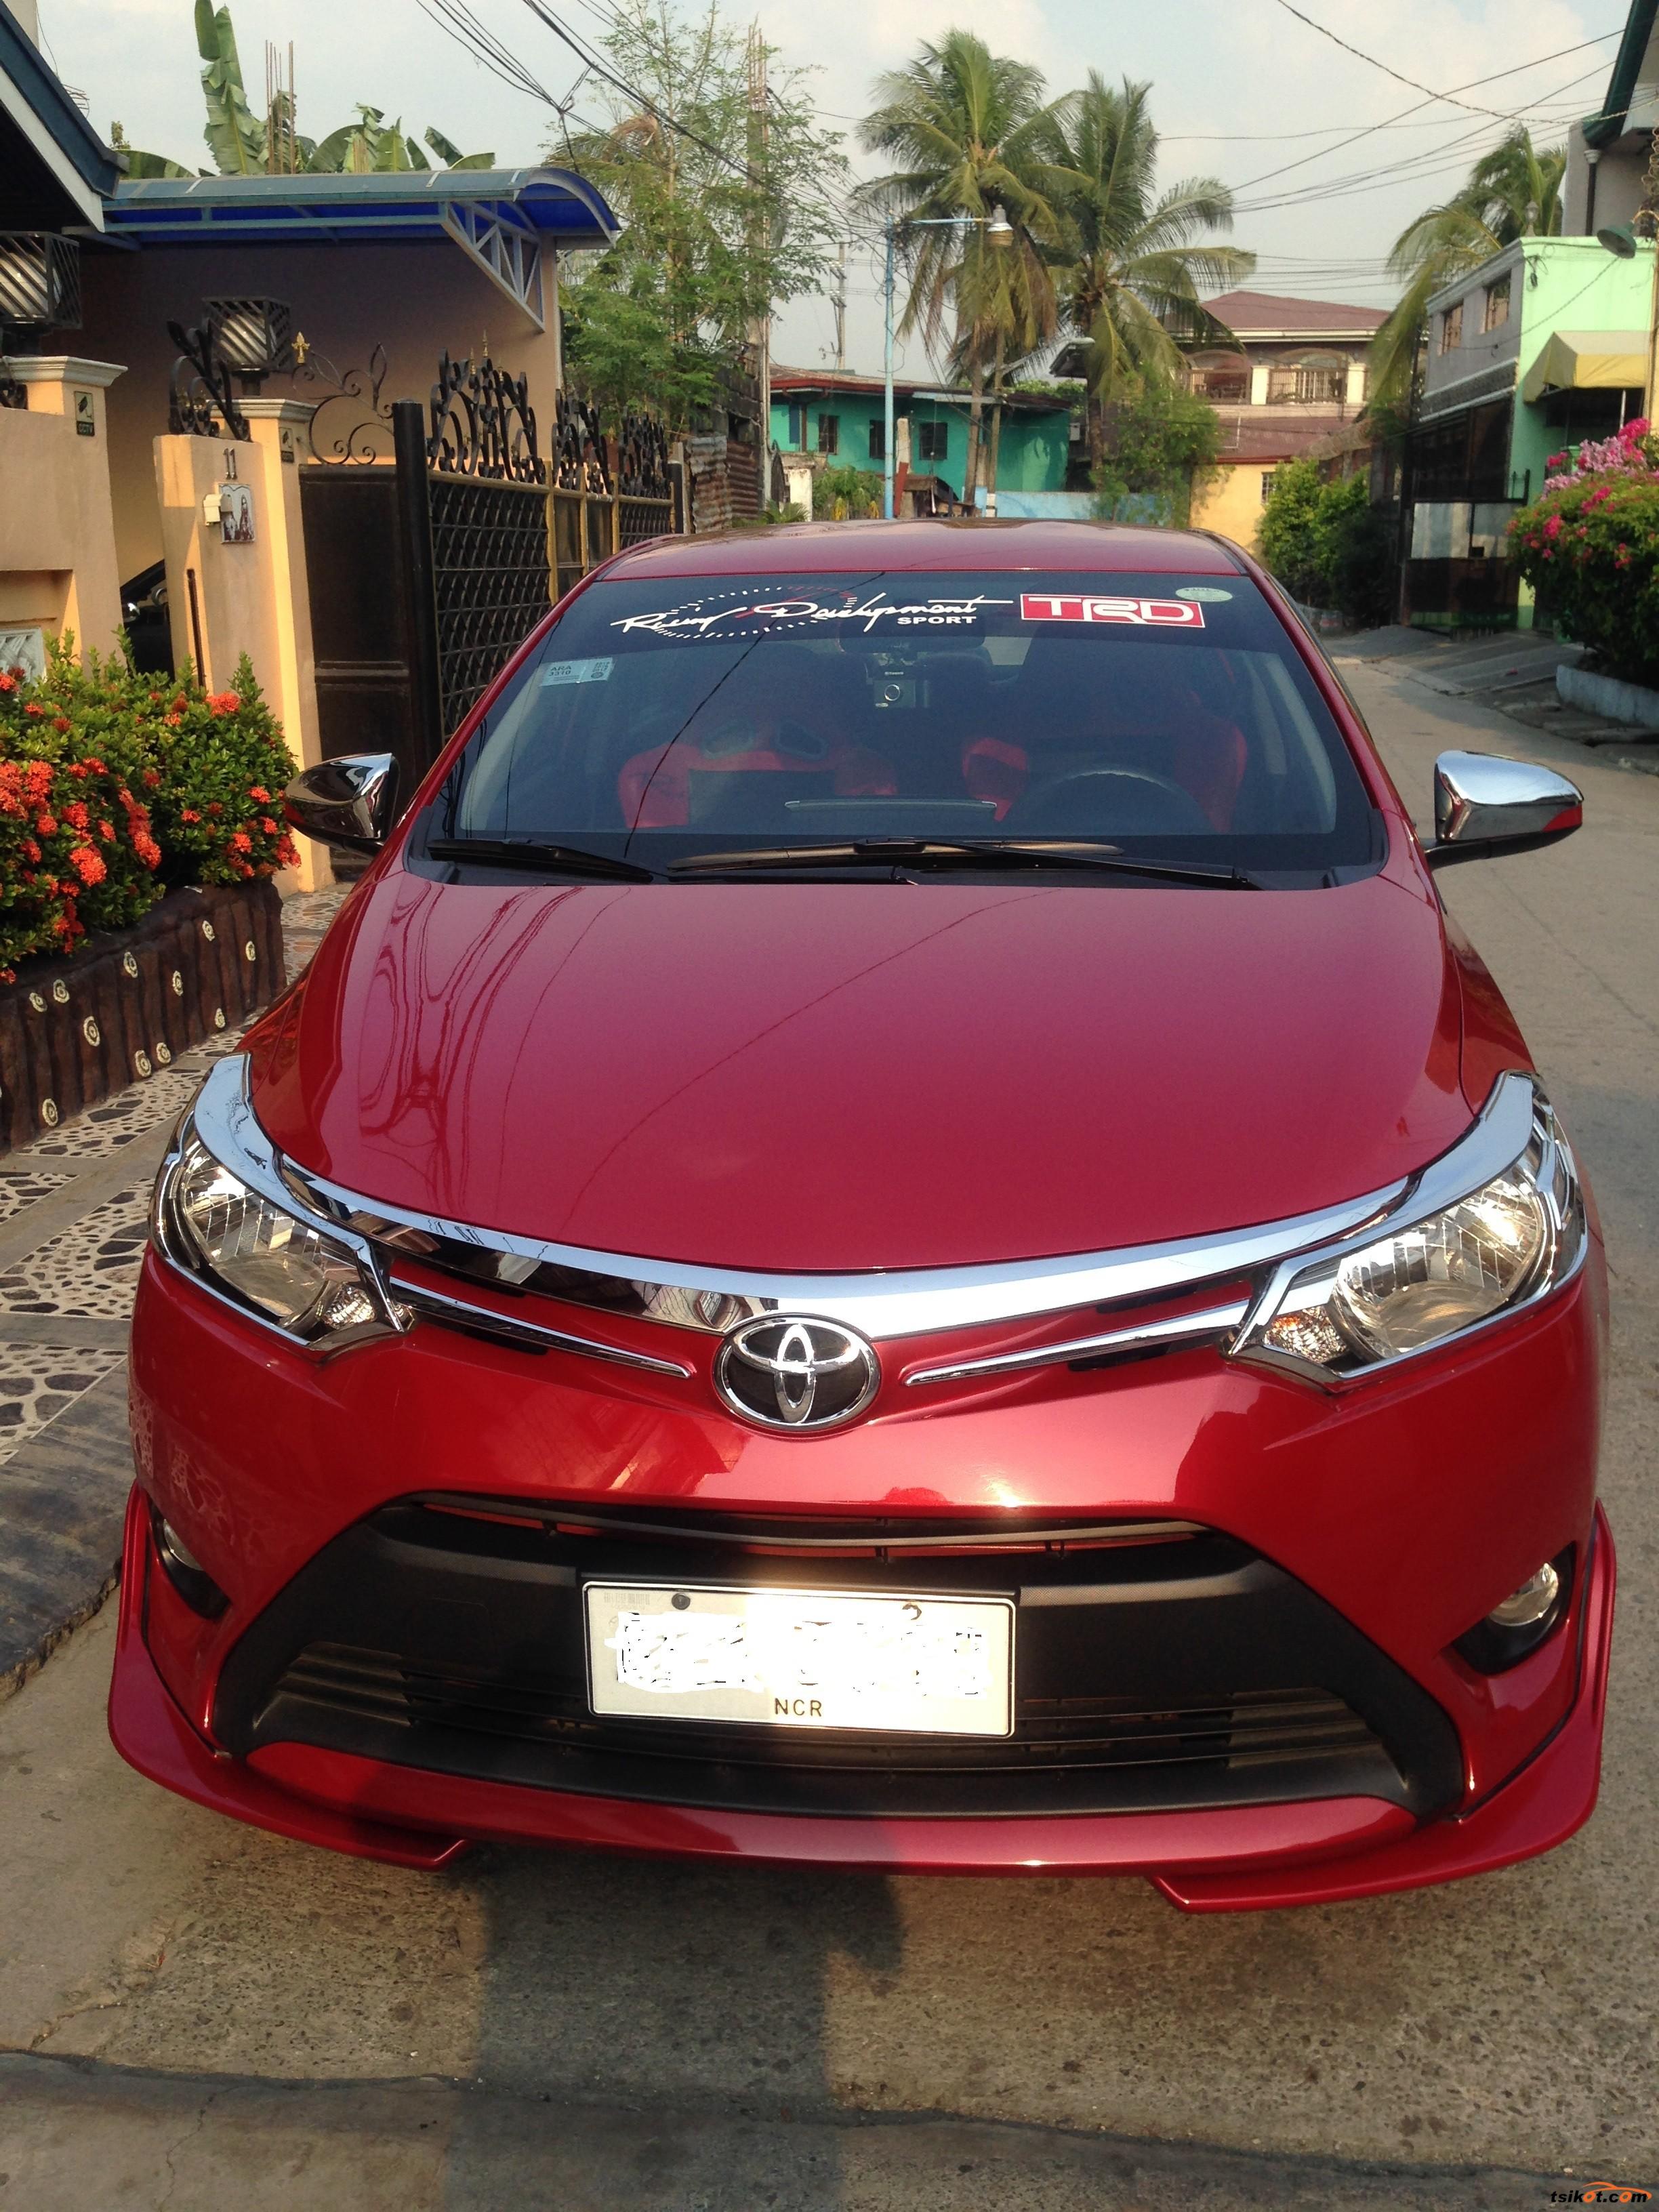 Toyota Vios 2015 - Car for Sale Calabarzon